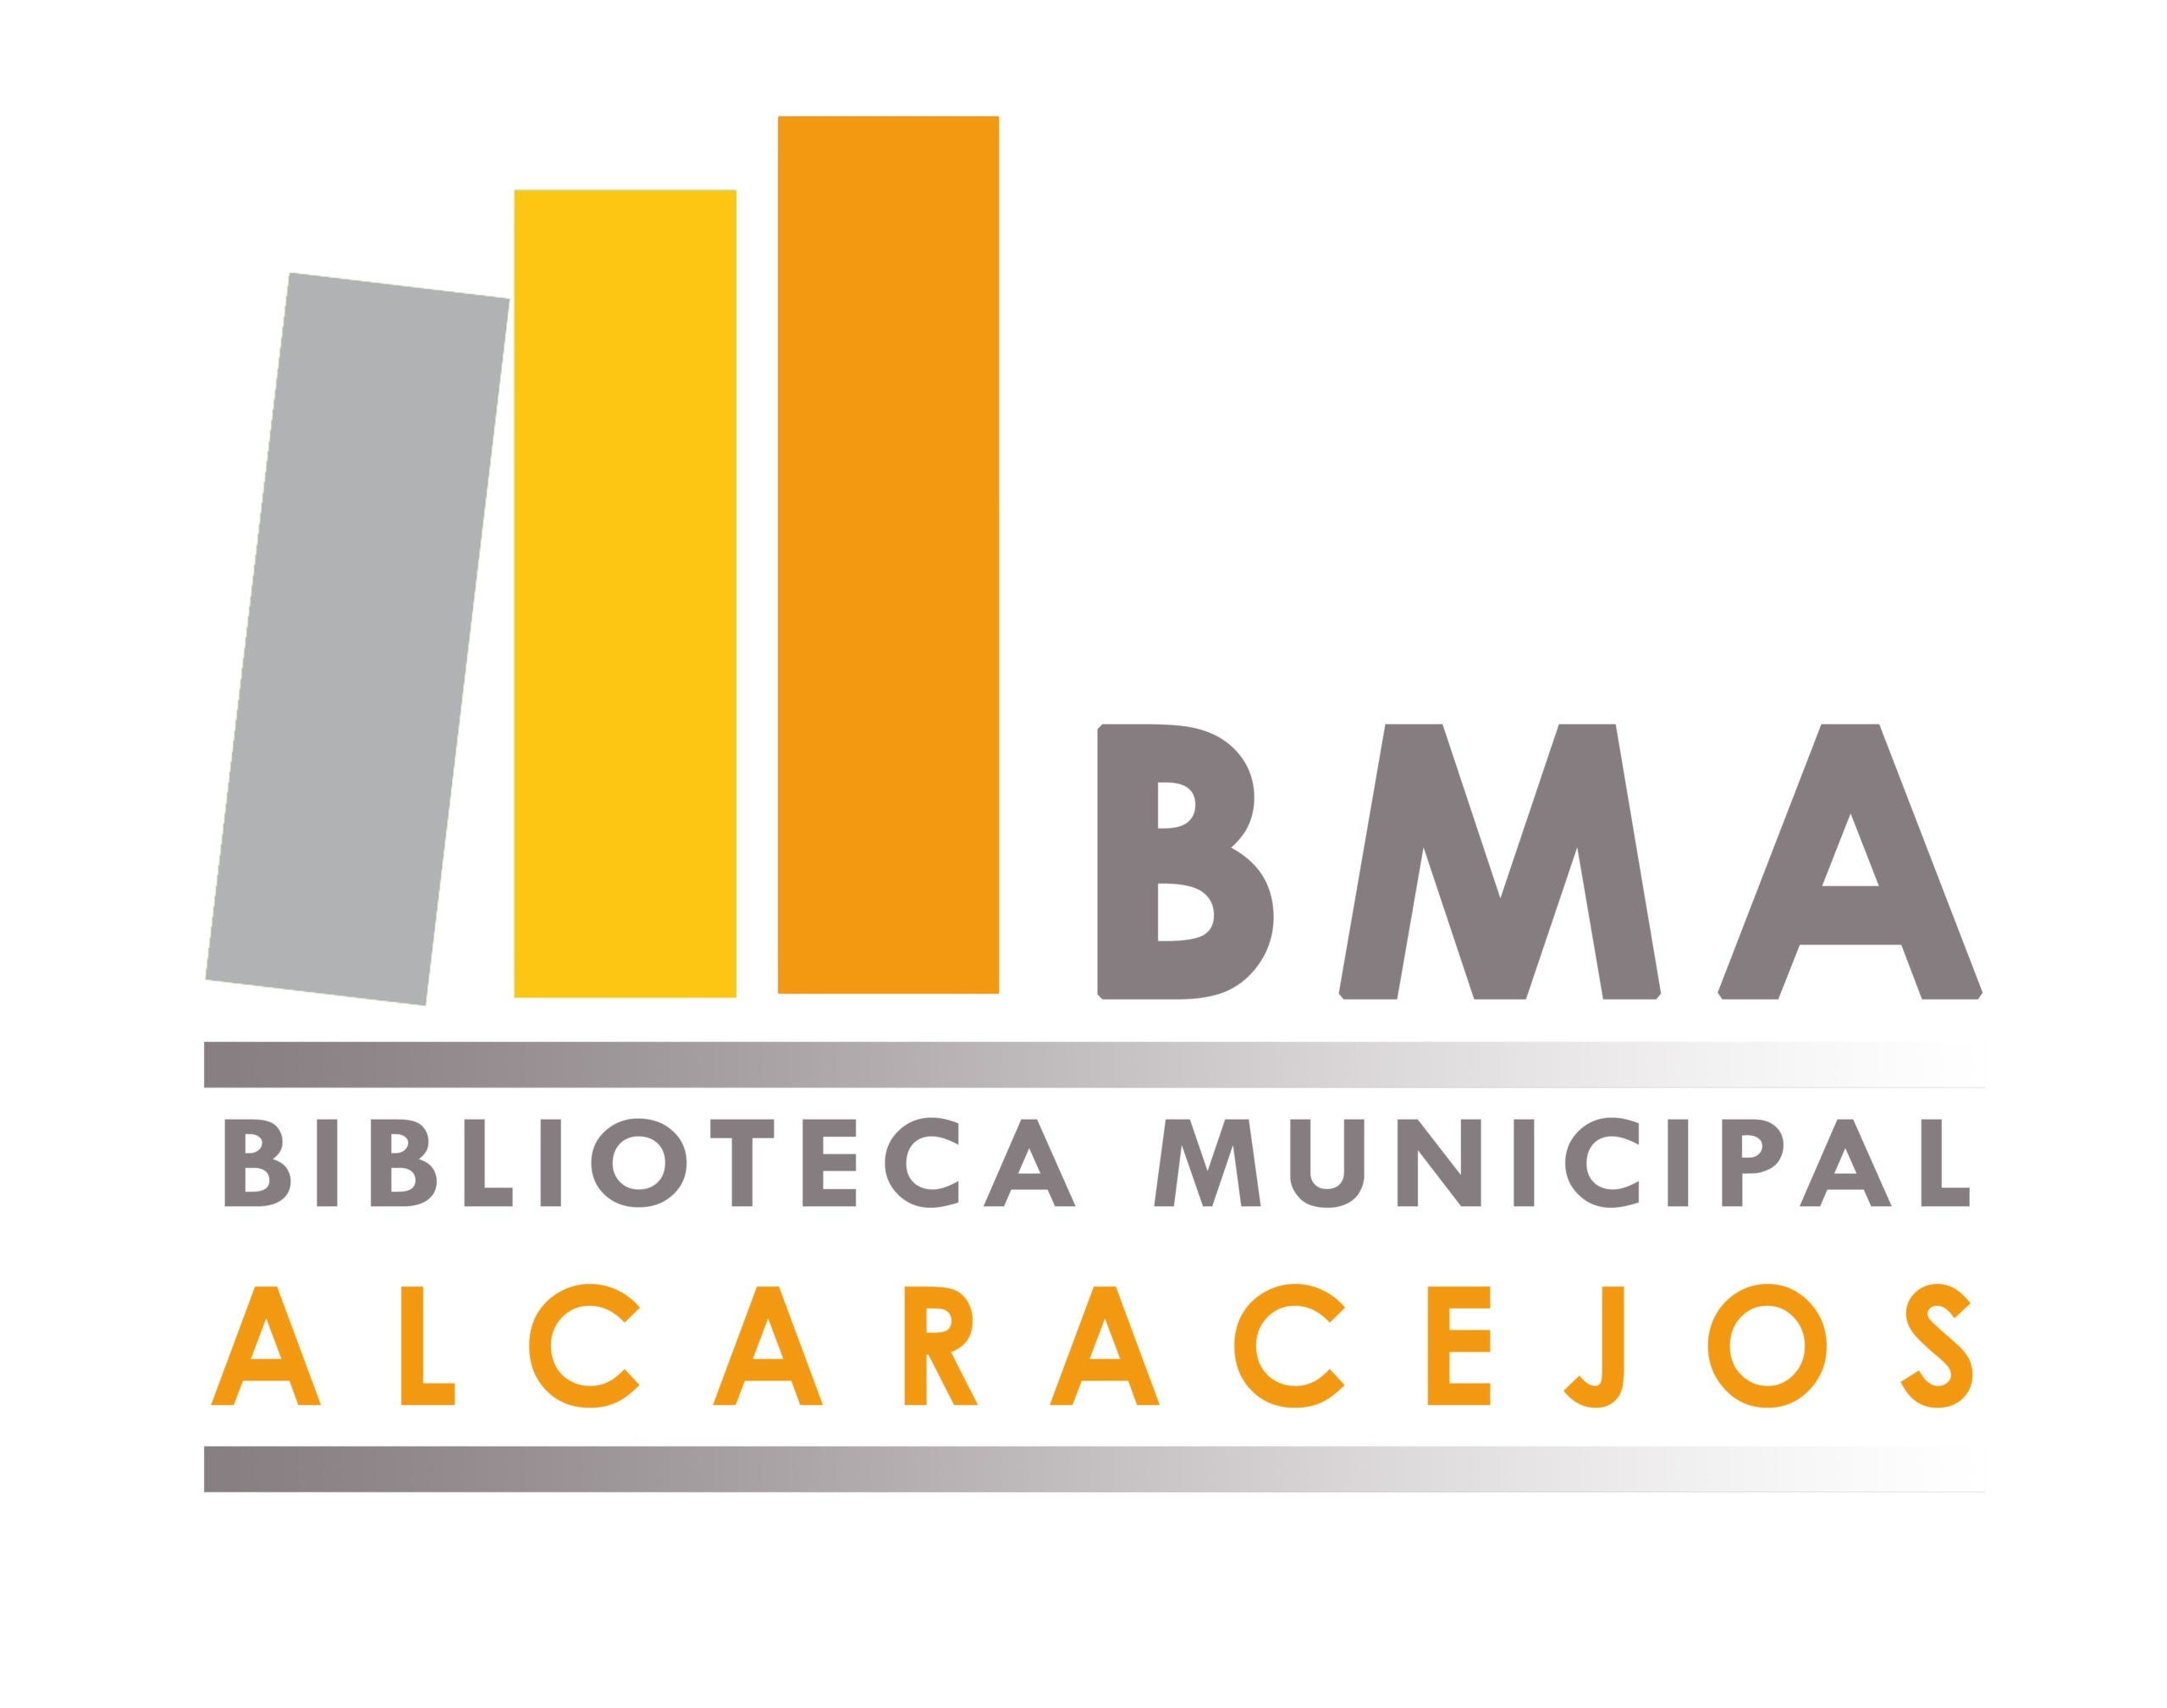 Biblioteca Municipal Alcaracejos